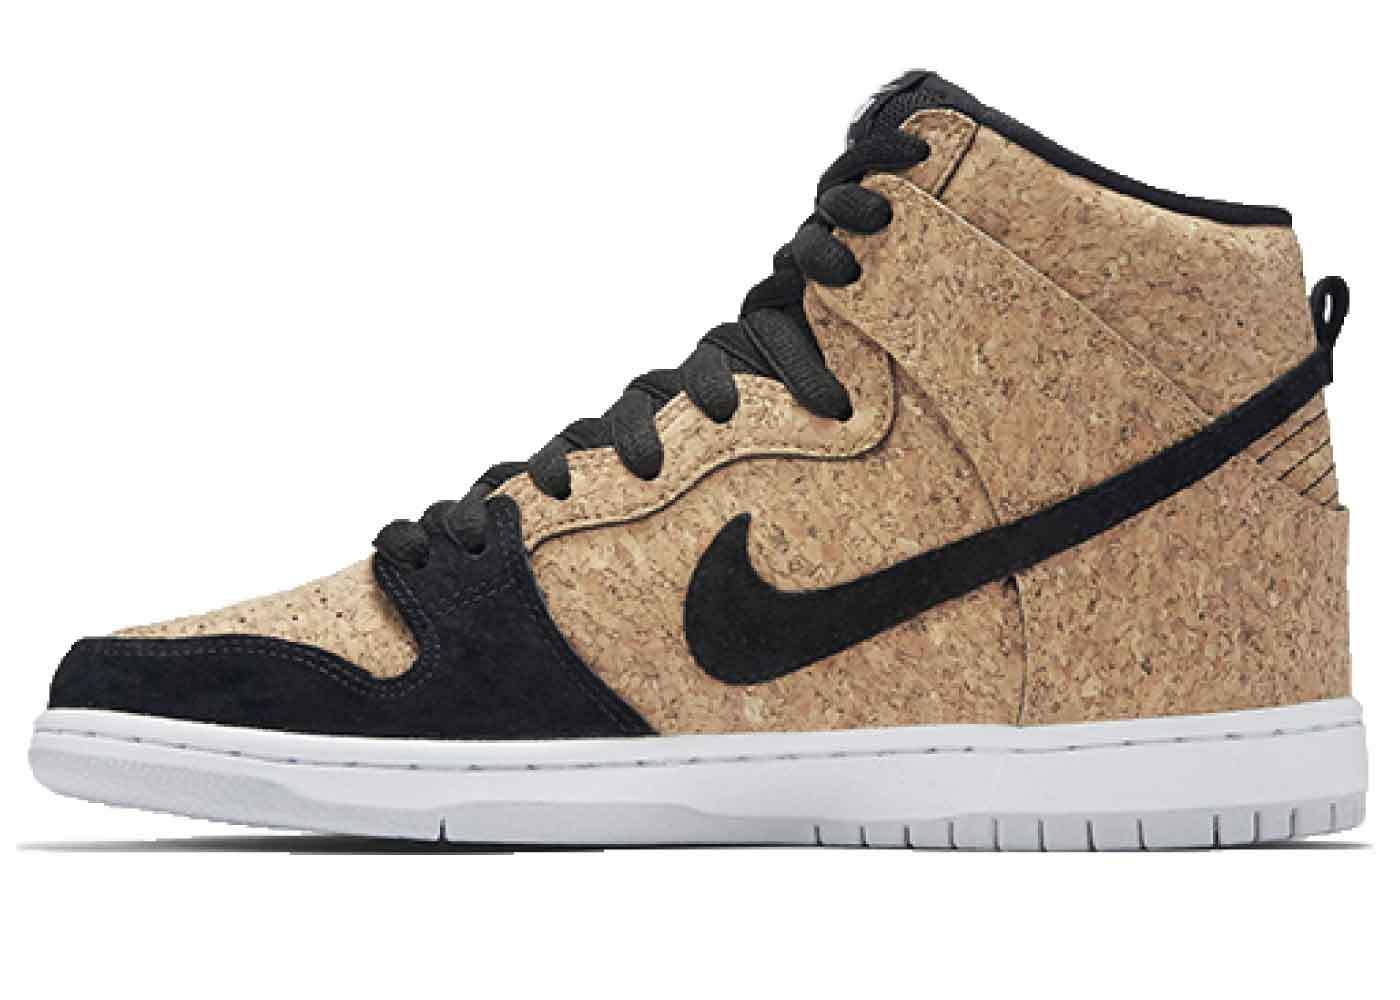 Nike SB Dunk High Corkの写真